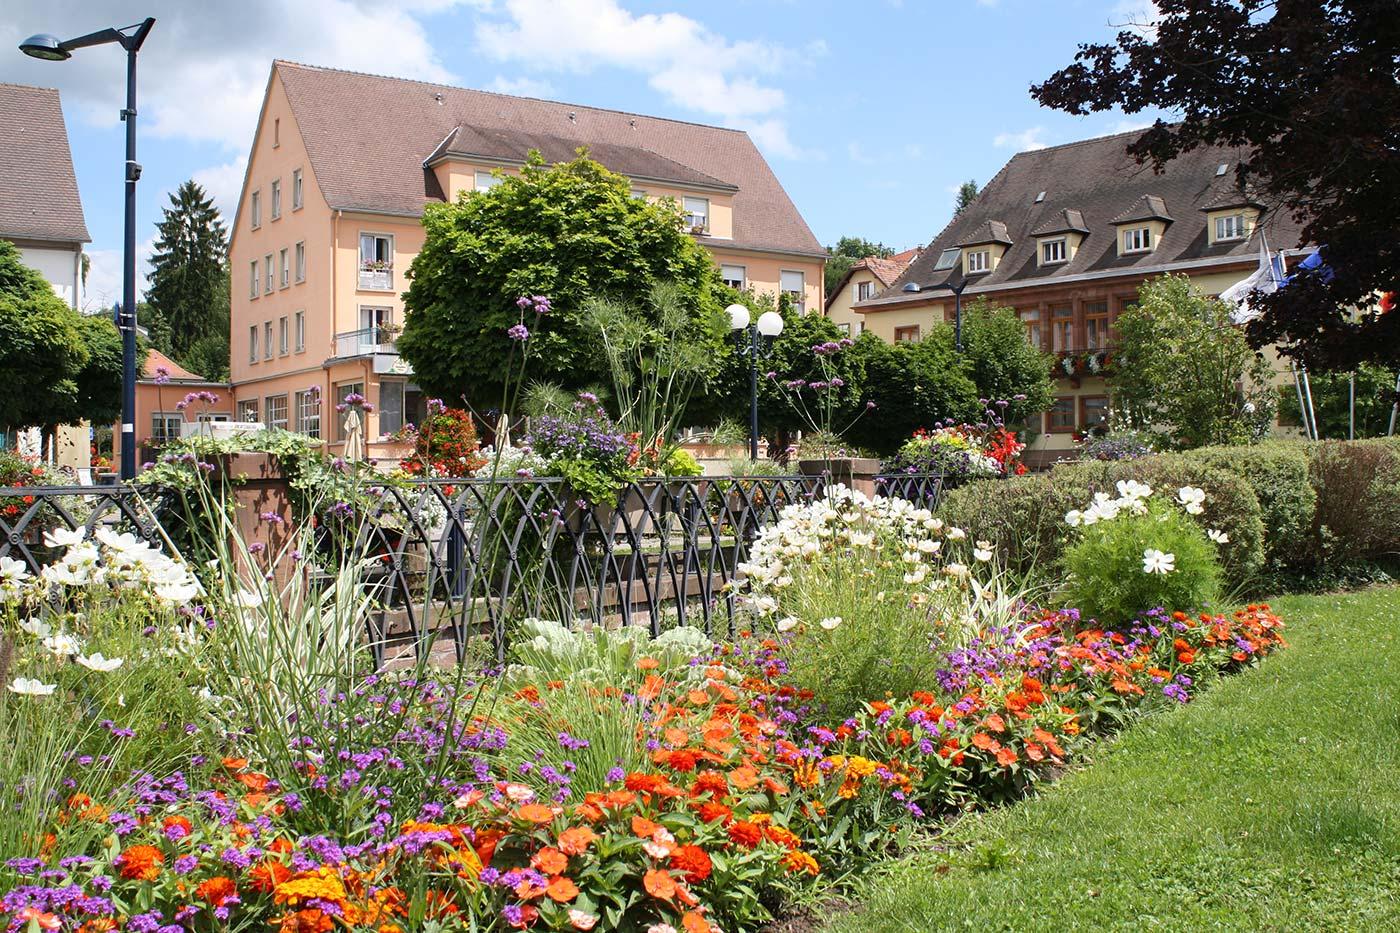 Week-end mondial du Bien-être, Niederbronn-les-Bains